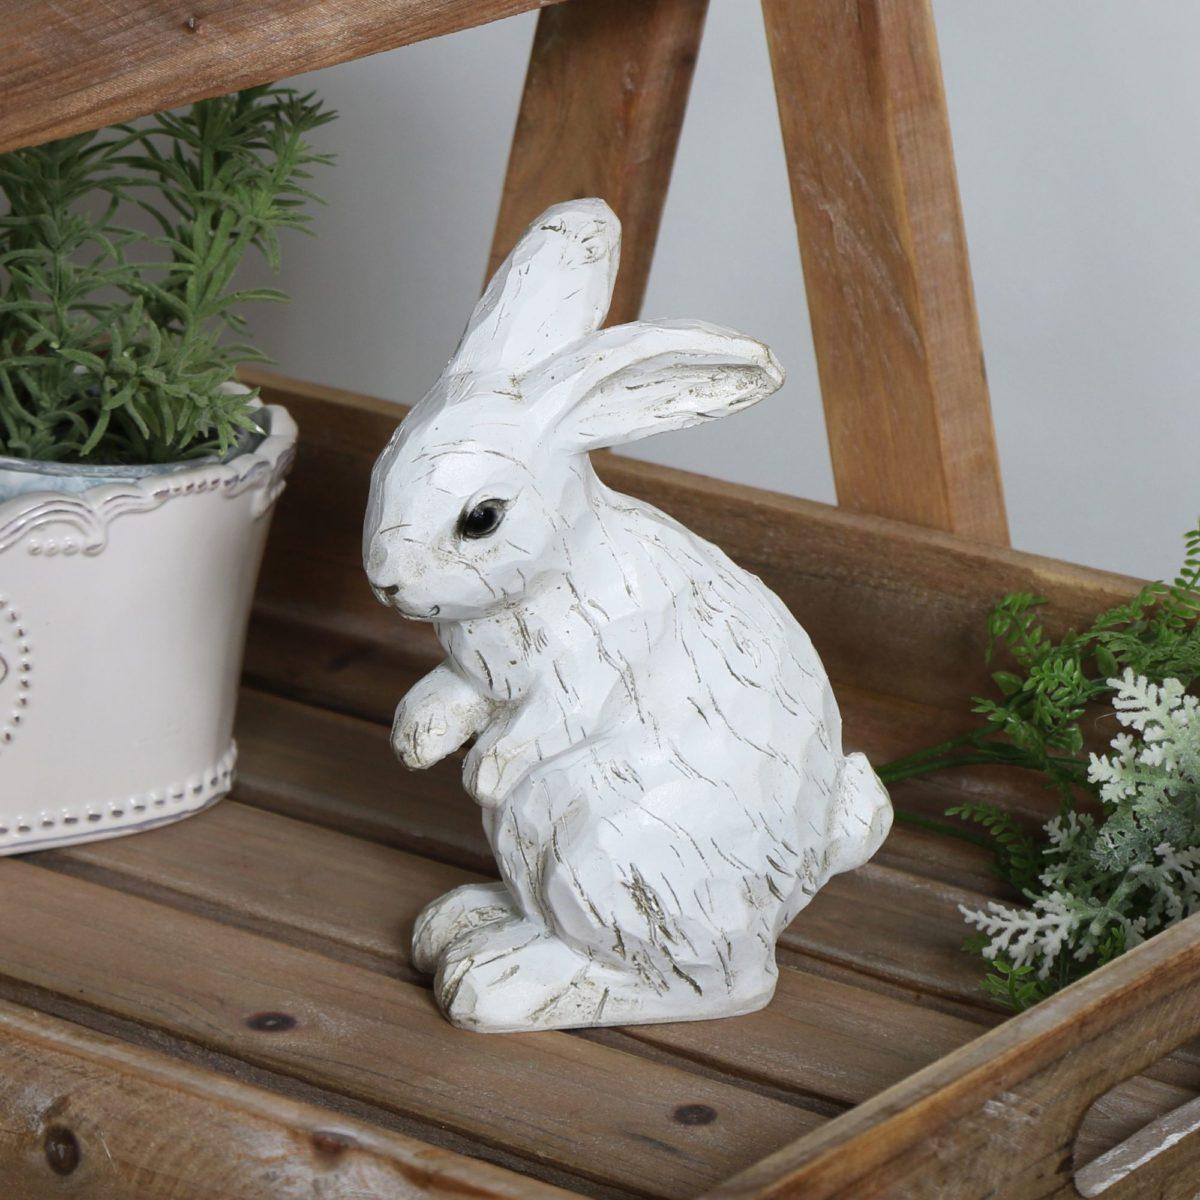 34melody-maison_decorative-white-rabbit-ornament-1200x1200.jpg